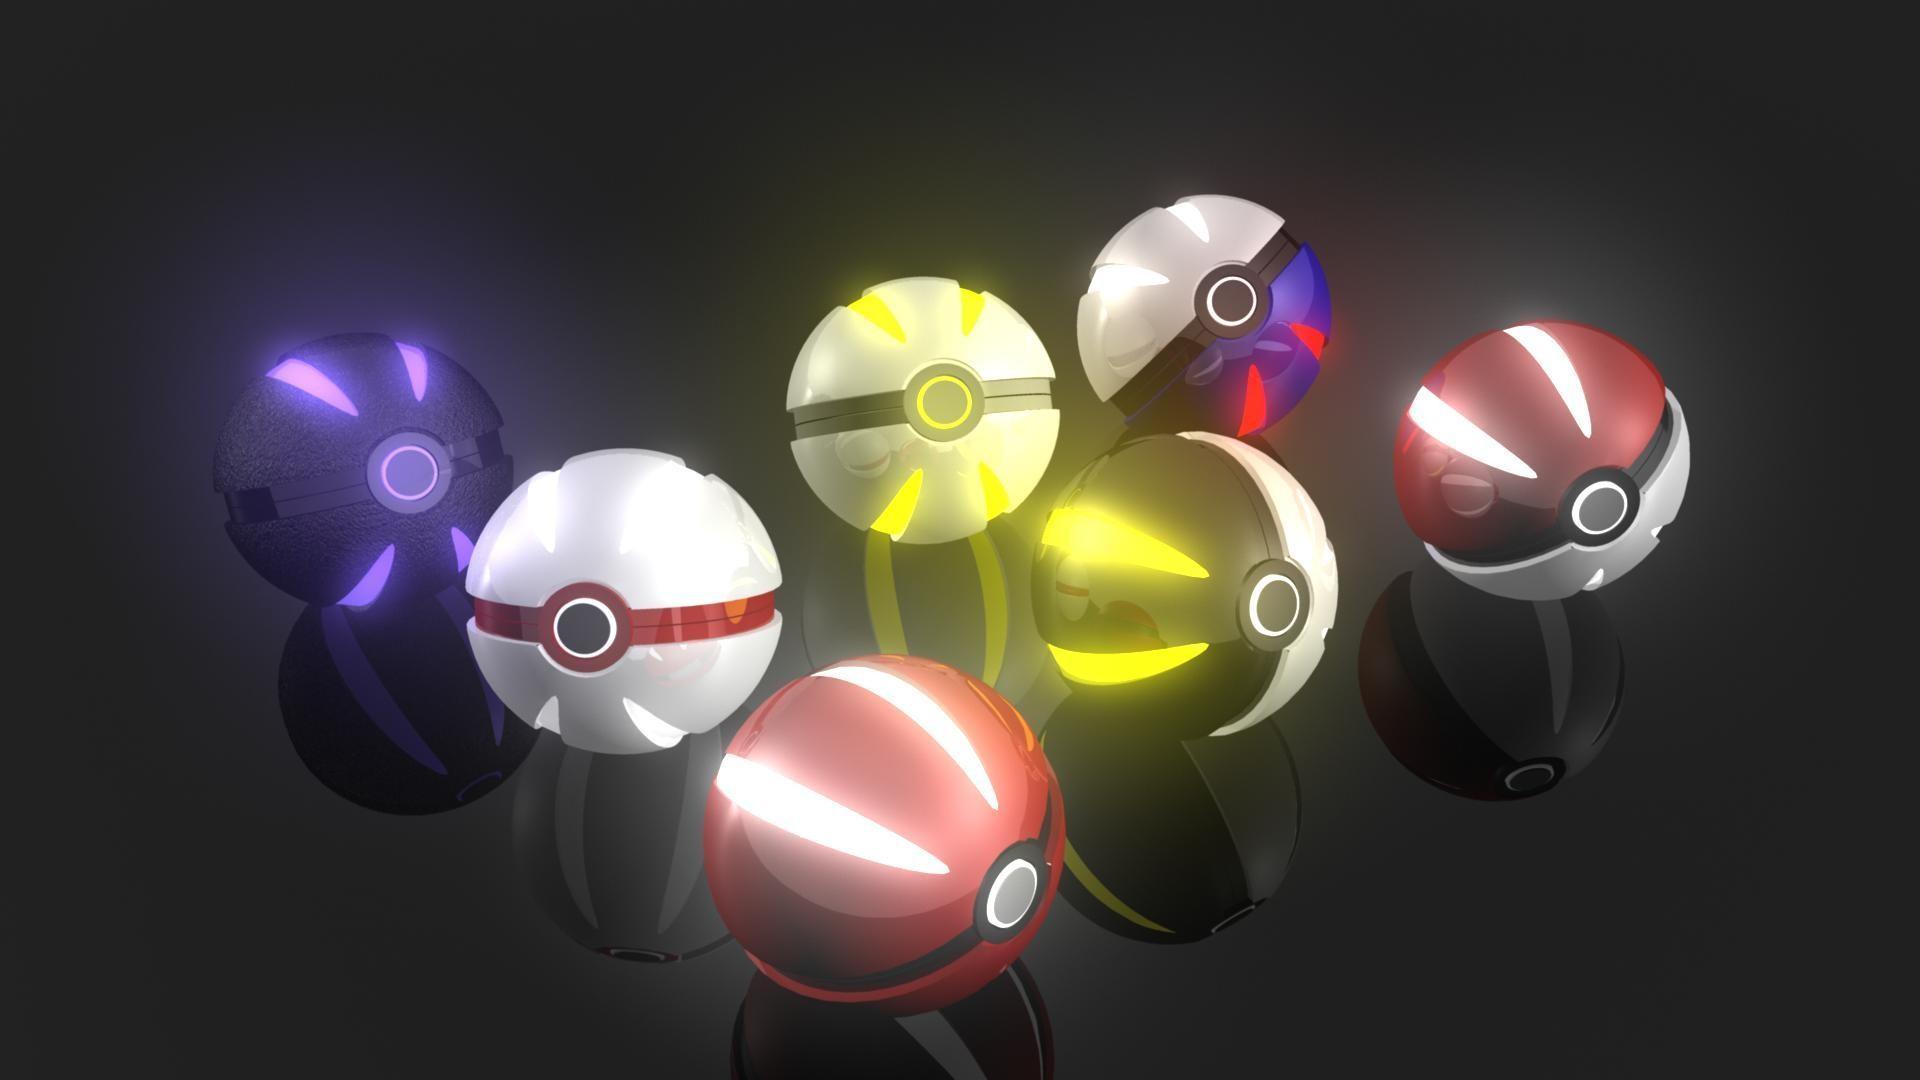 <b>Pokemon Pokeball Wallpaper</b> – WallpaperSafari